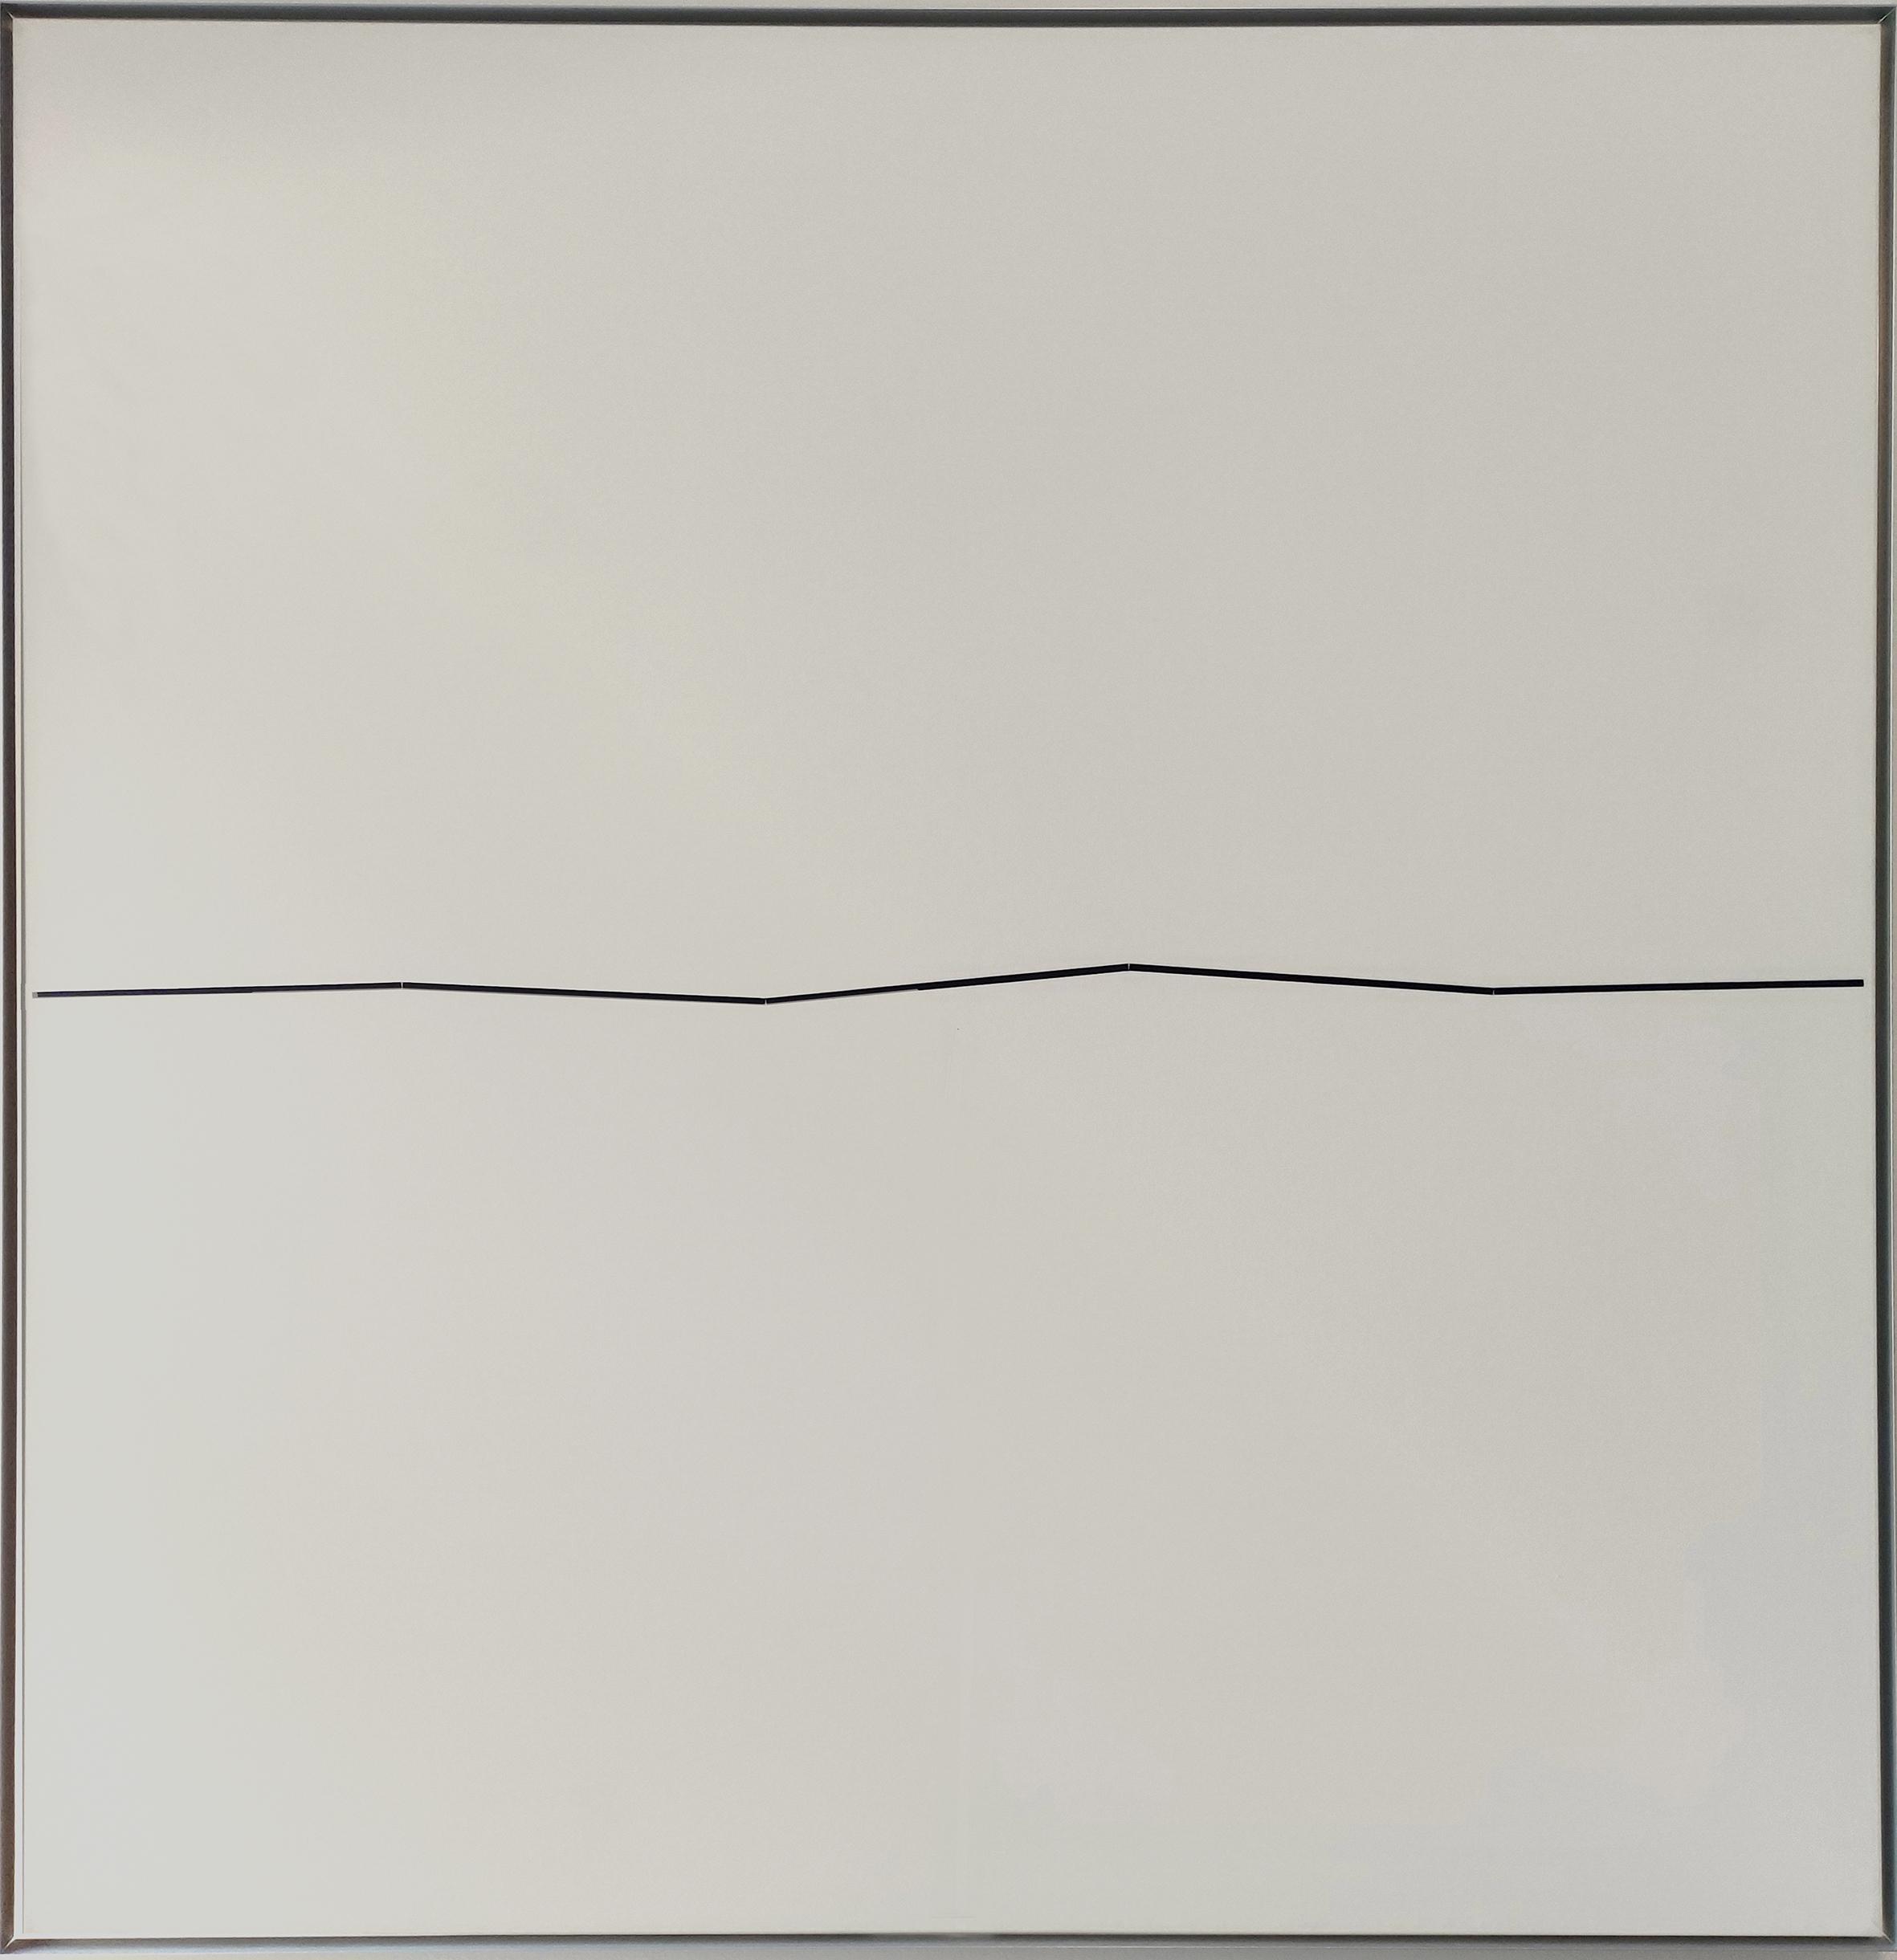 Diet Sayler, Fünf Linien, 1977, Acryl auf Leinwand, 140x140 cm